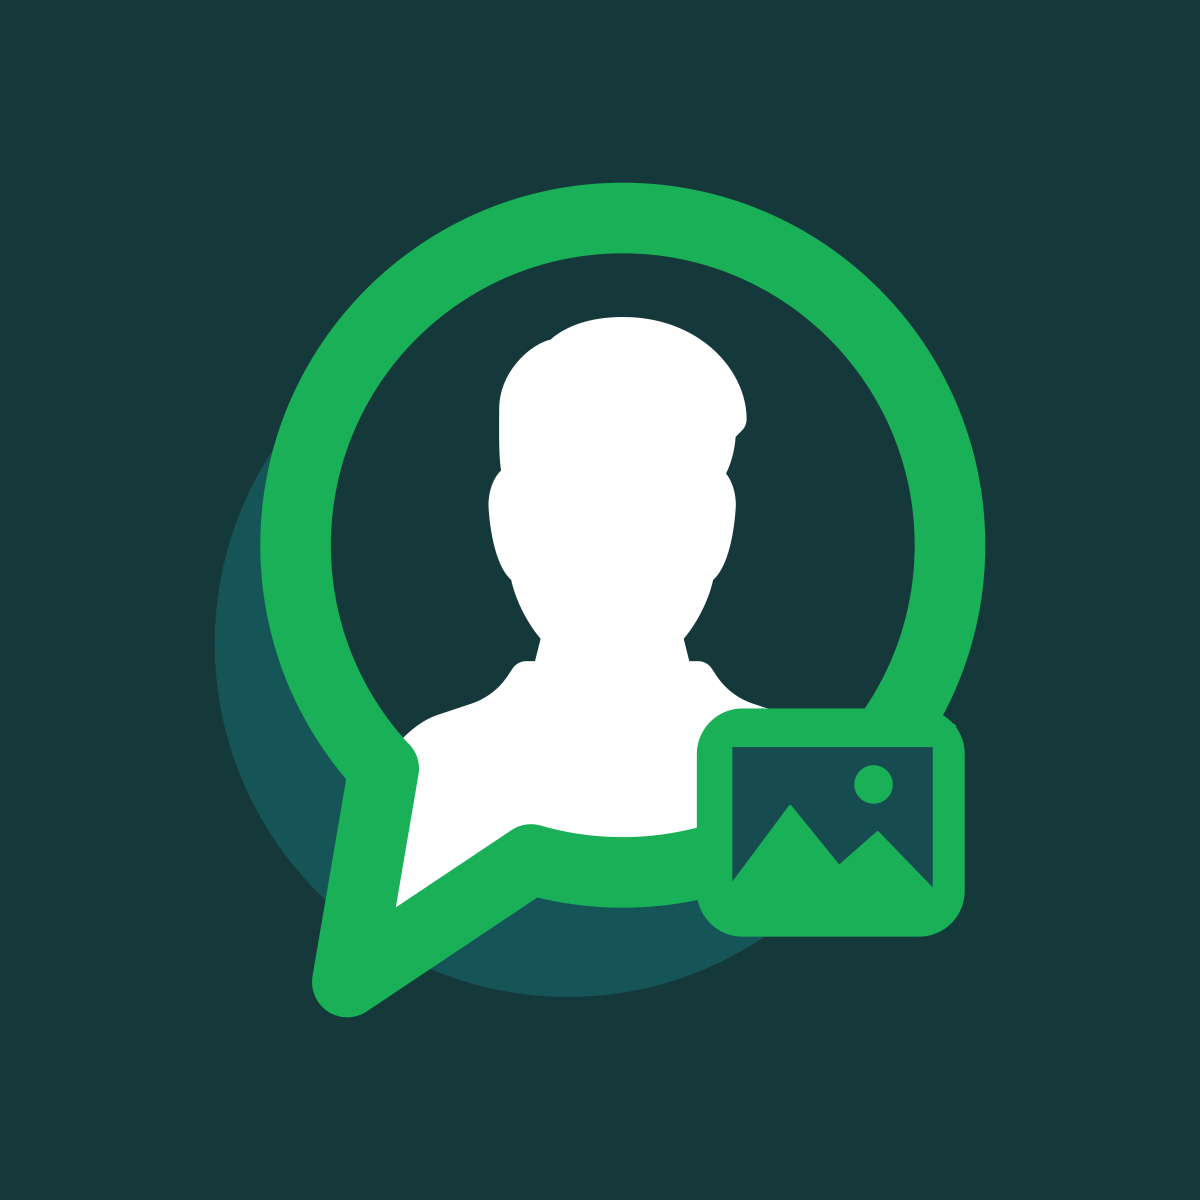 Imagenes para perfil de whatsapp   Imagenes para perfil, Imagen para perfil  whatsapp, Fotos perfil whatsapp